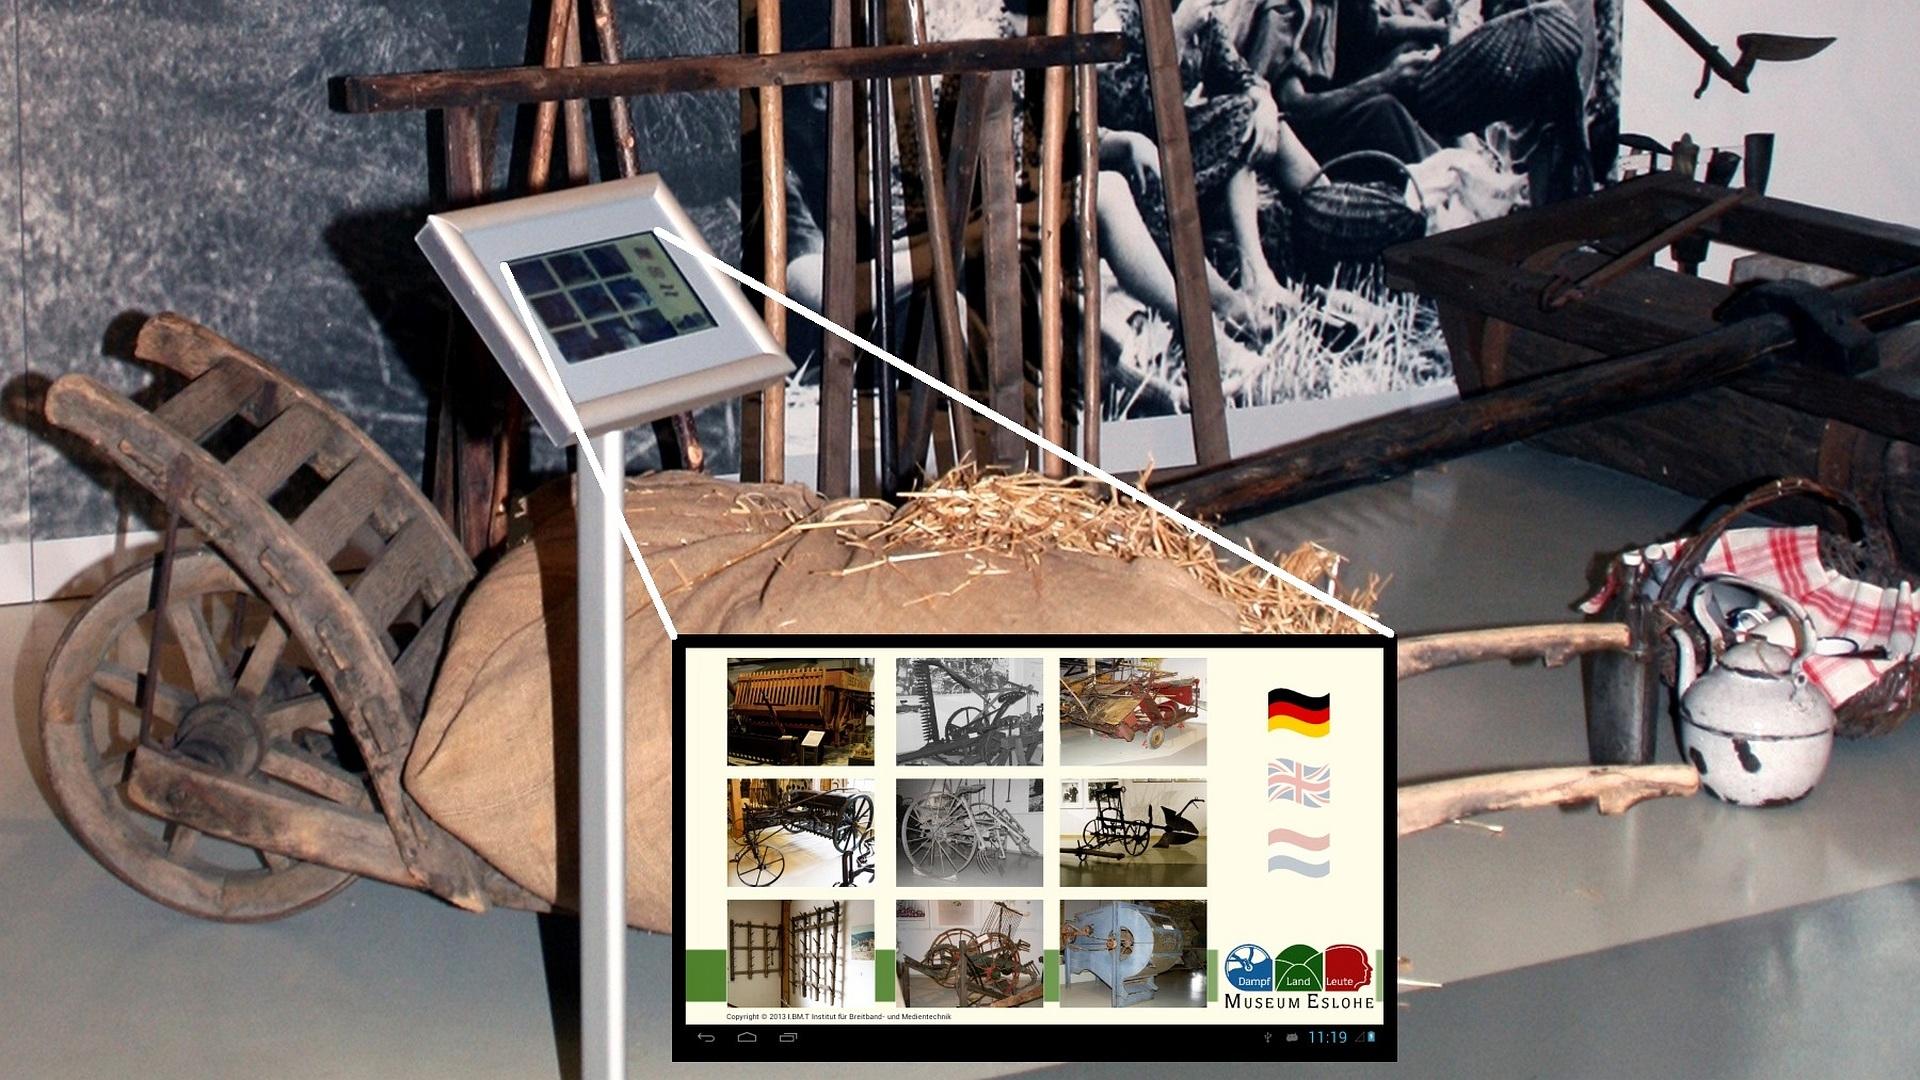 MuseumEslohe02